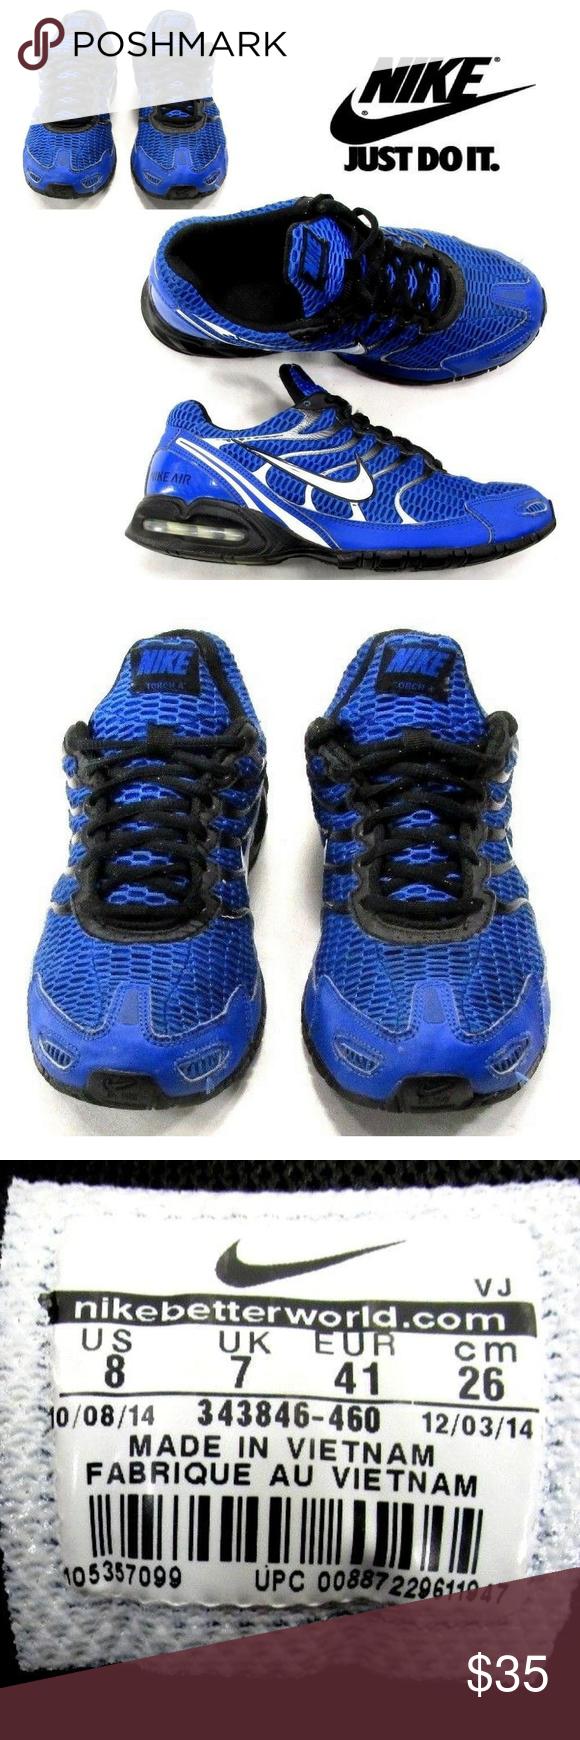 f0dc5d856f Royal Blue · NIKE AIR MAX Torch 4 IV Men's 8 Running Shoes S3 NIKE AIR MAX  Torch 4